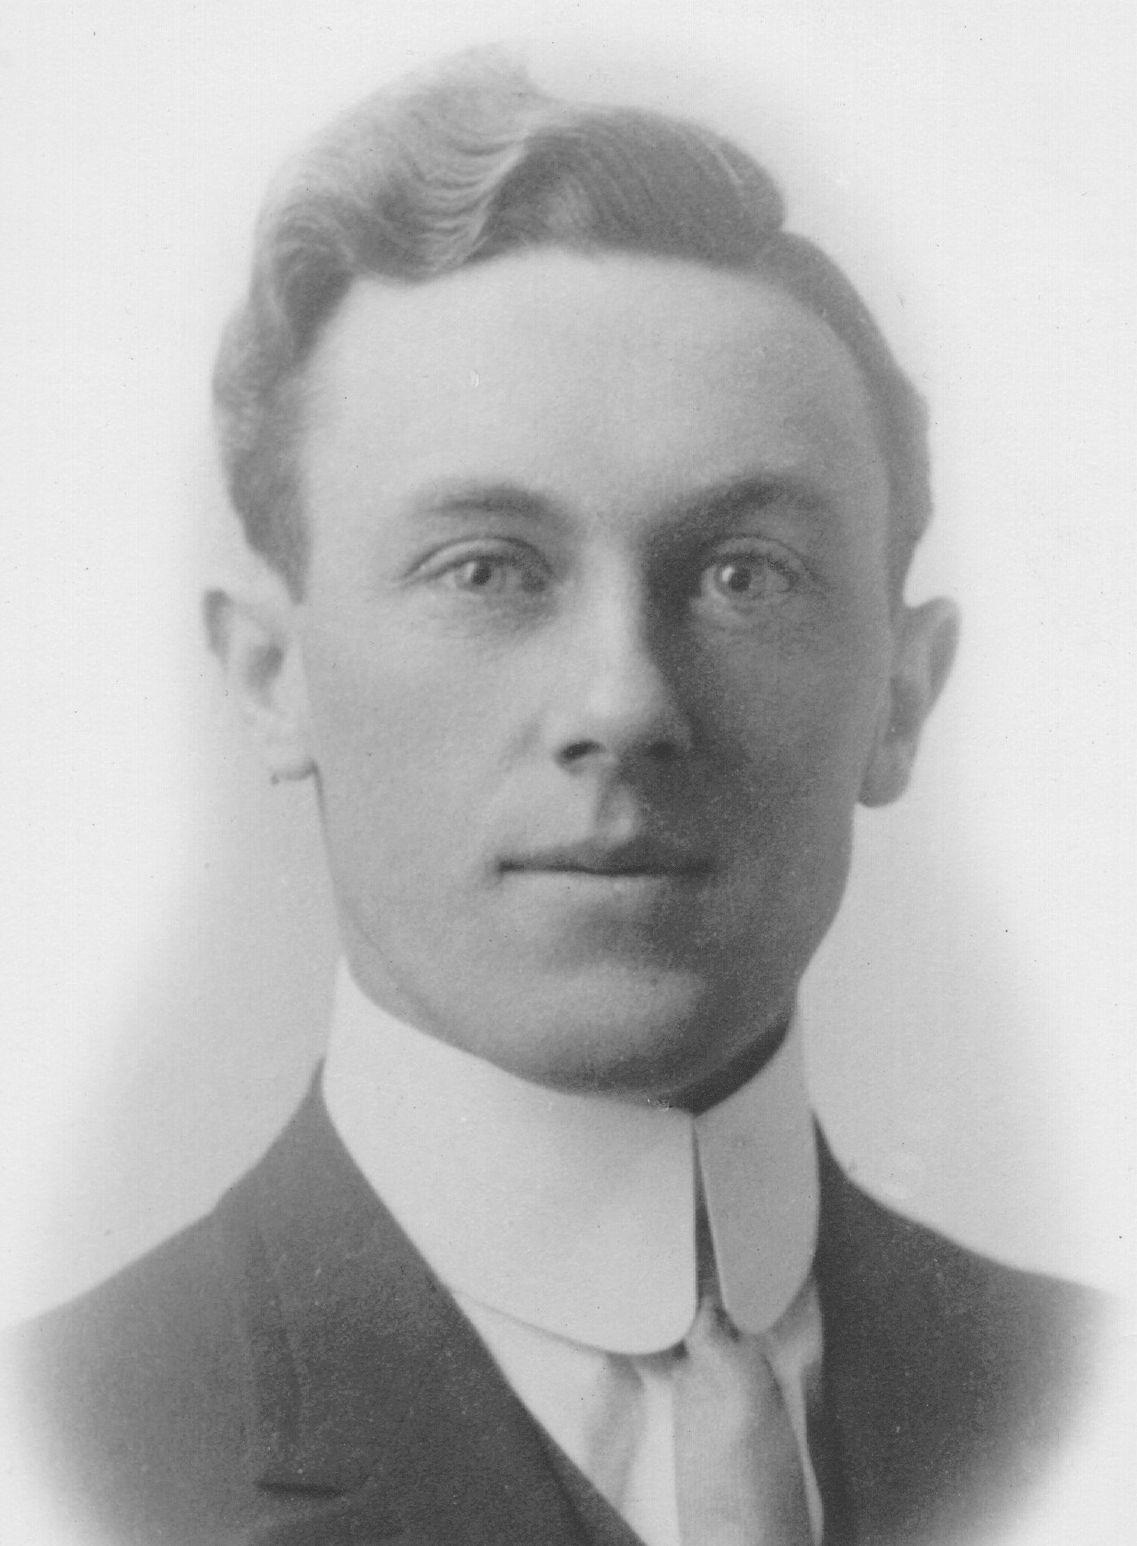 Taggart, William Scott